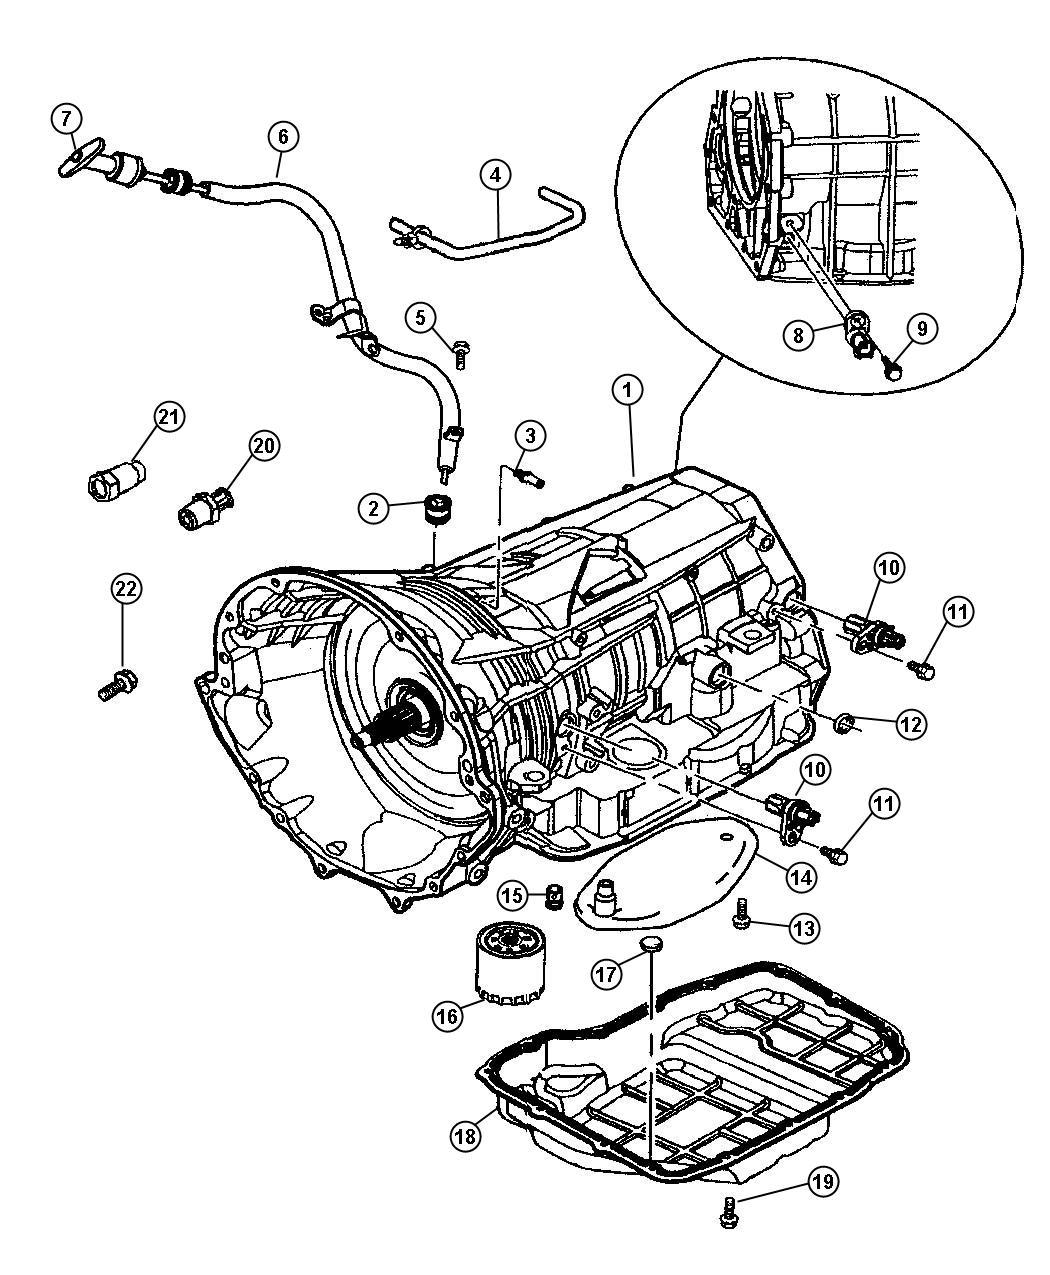 42rle wiring diagram